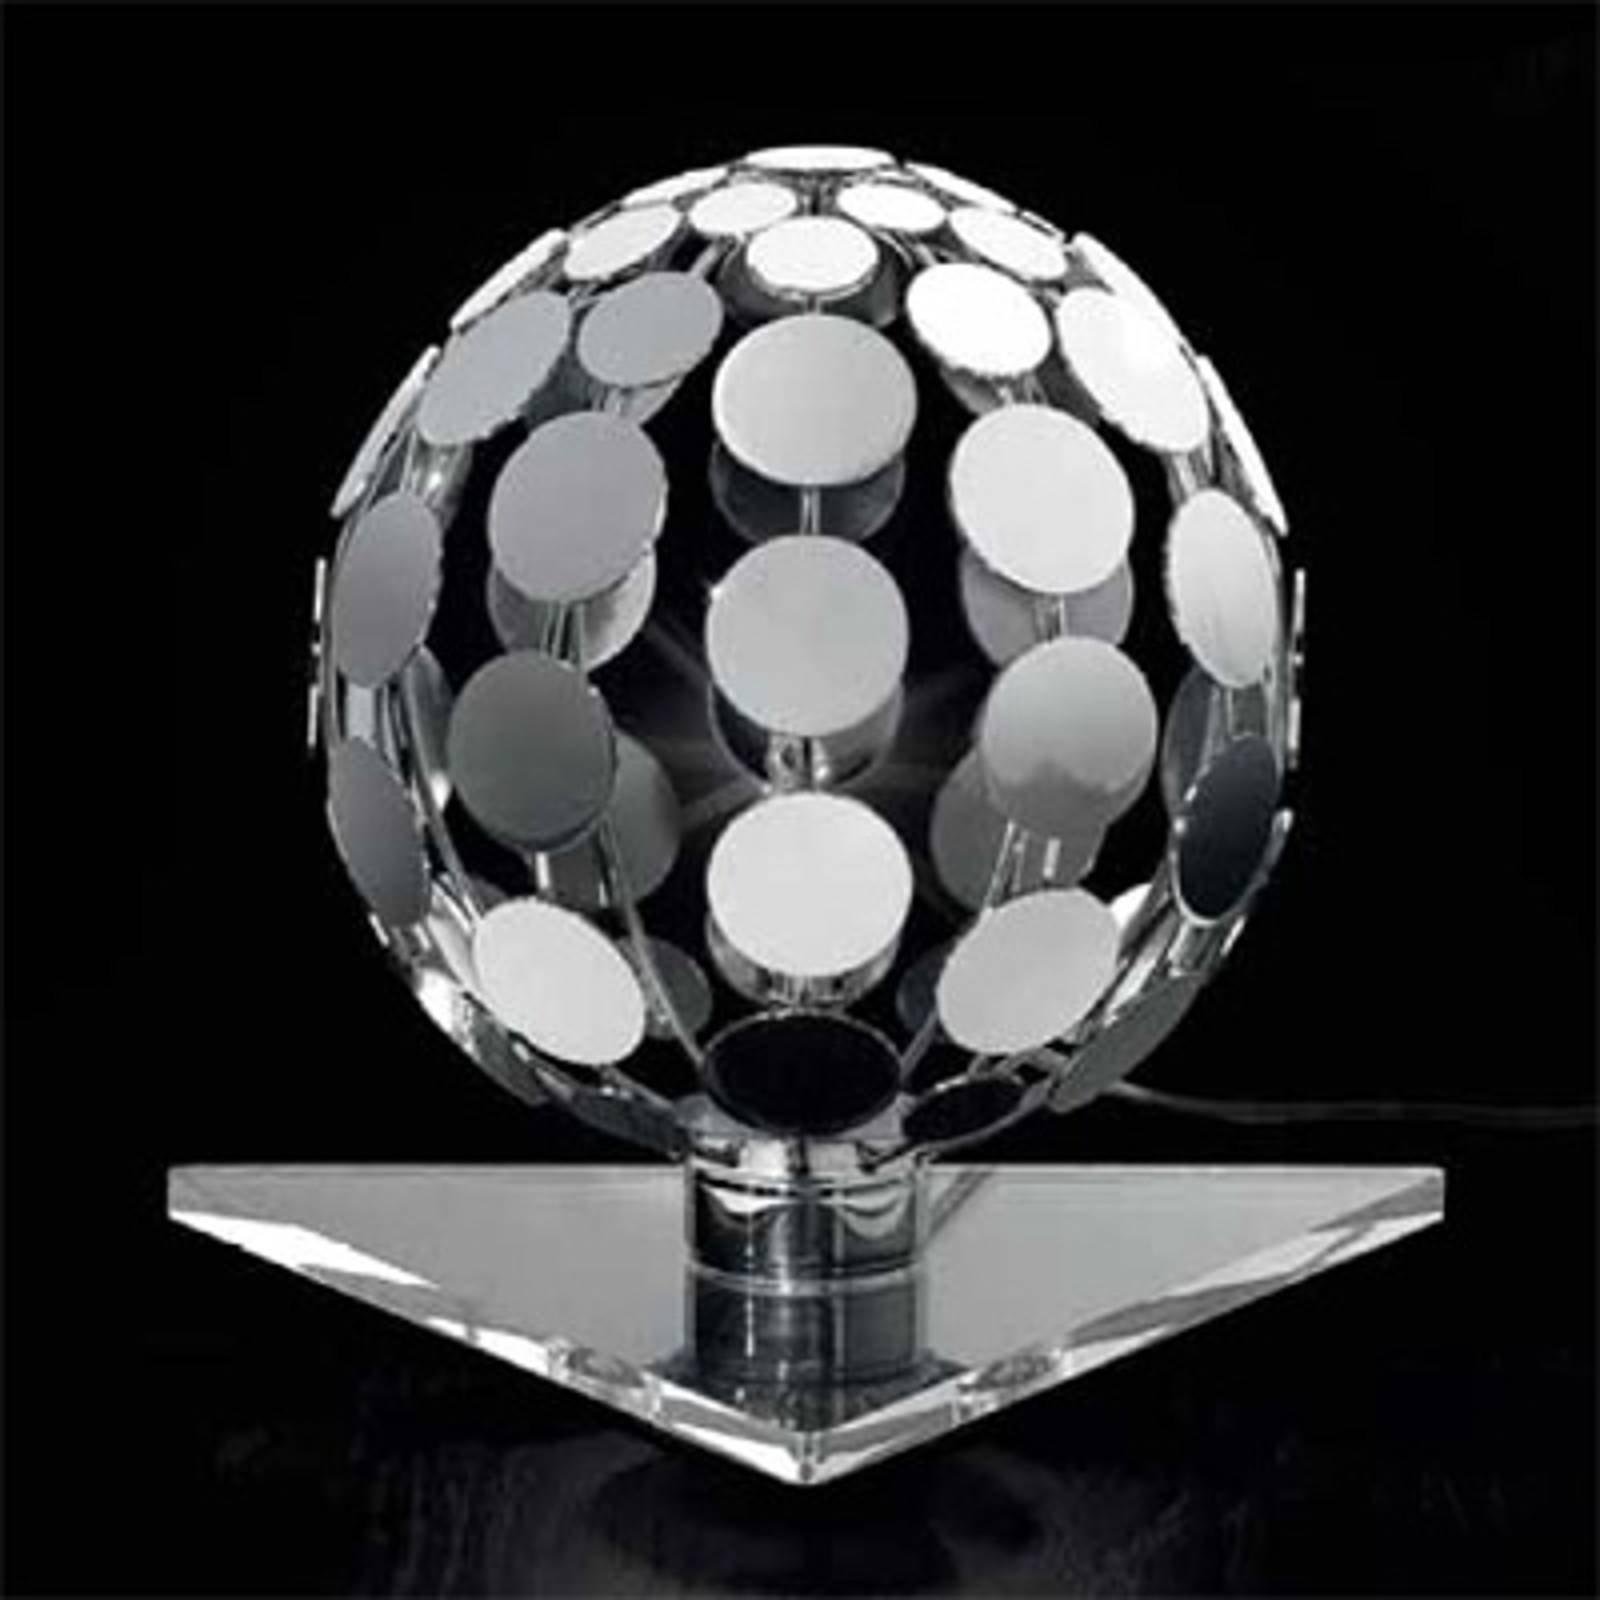 Sfera bordlampe med transparent fot, 10 cm